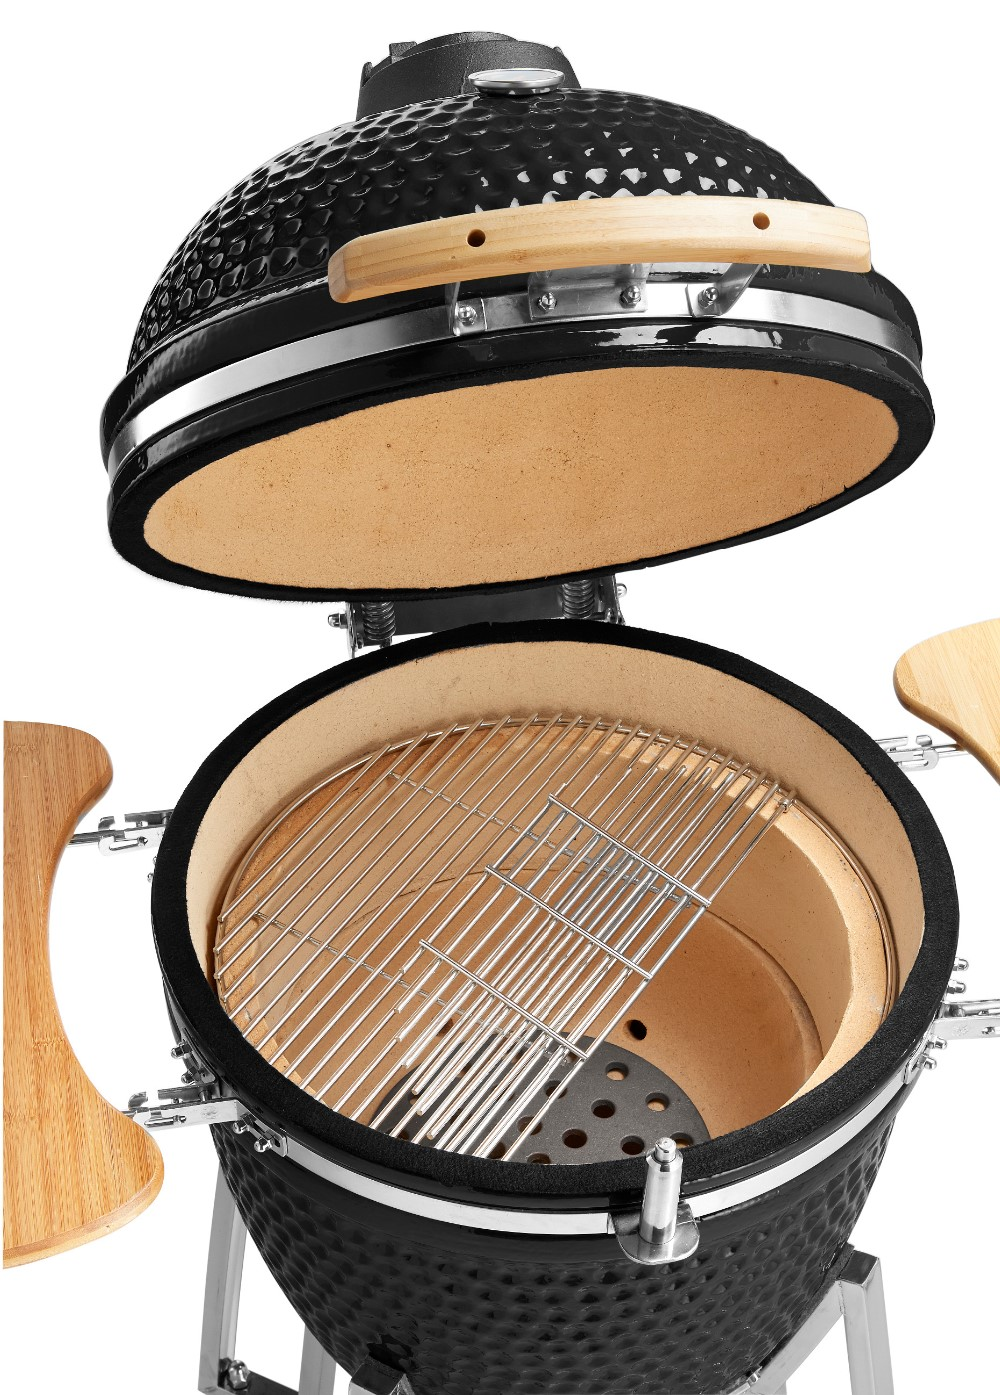 Barbecue Japonais Ceramique Top Plancha